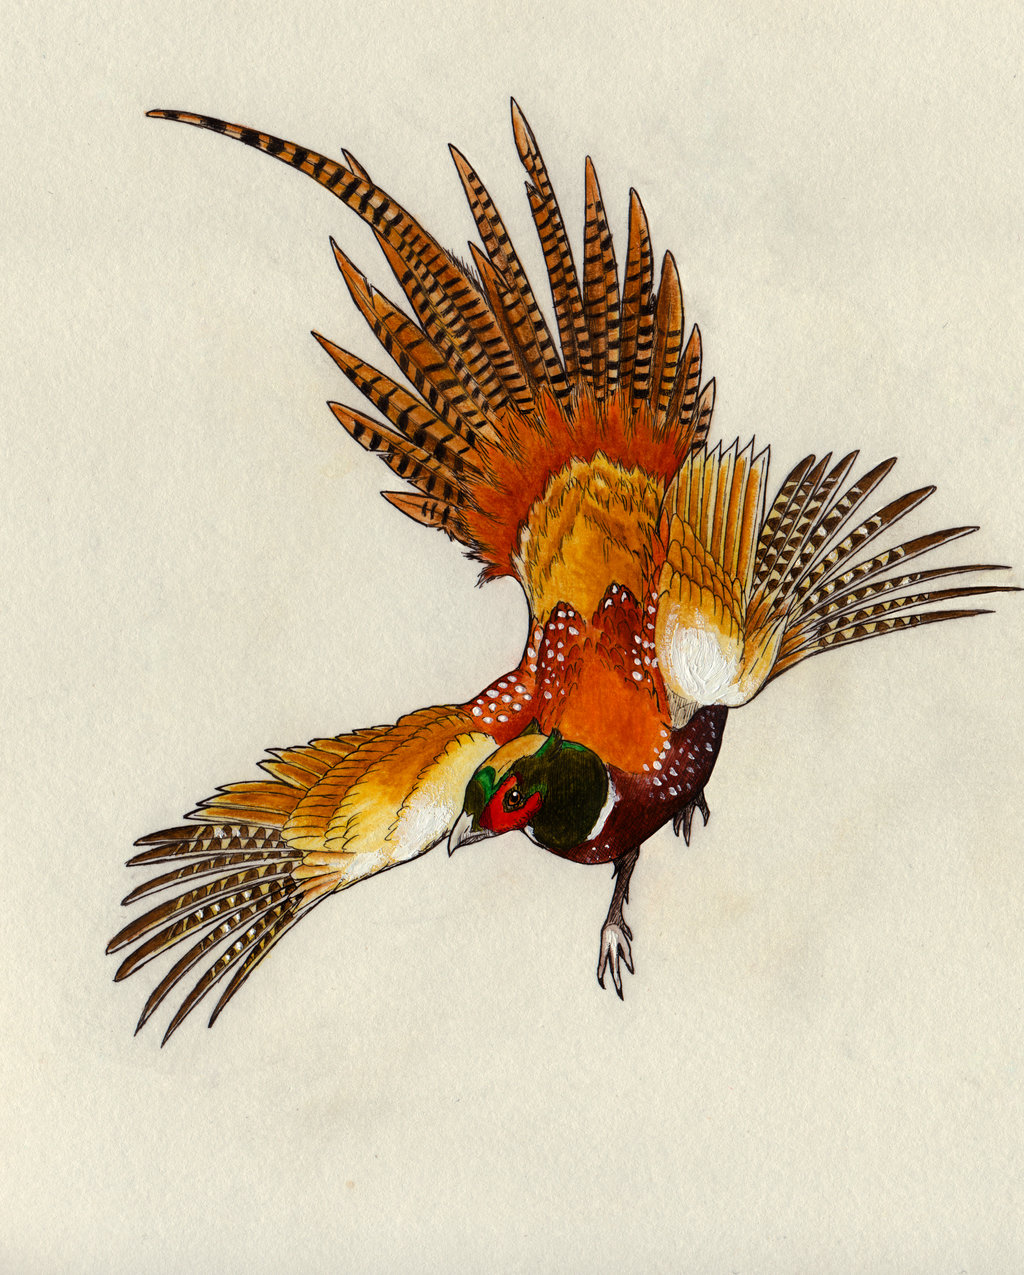 1024x1275 Of The Pheasant By Eurwentala